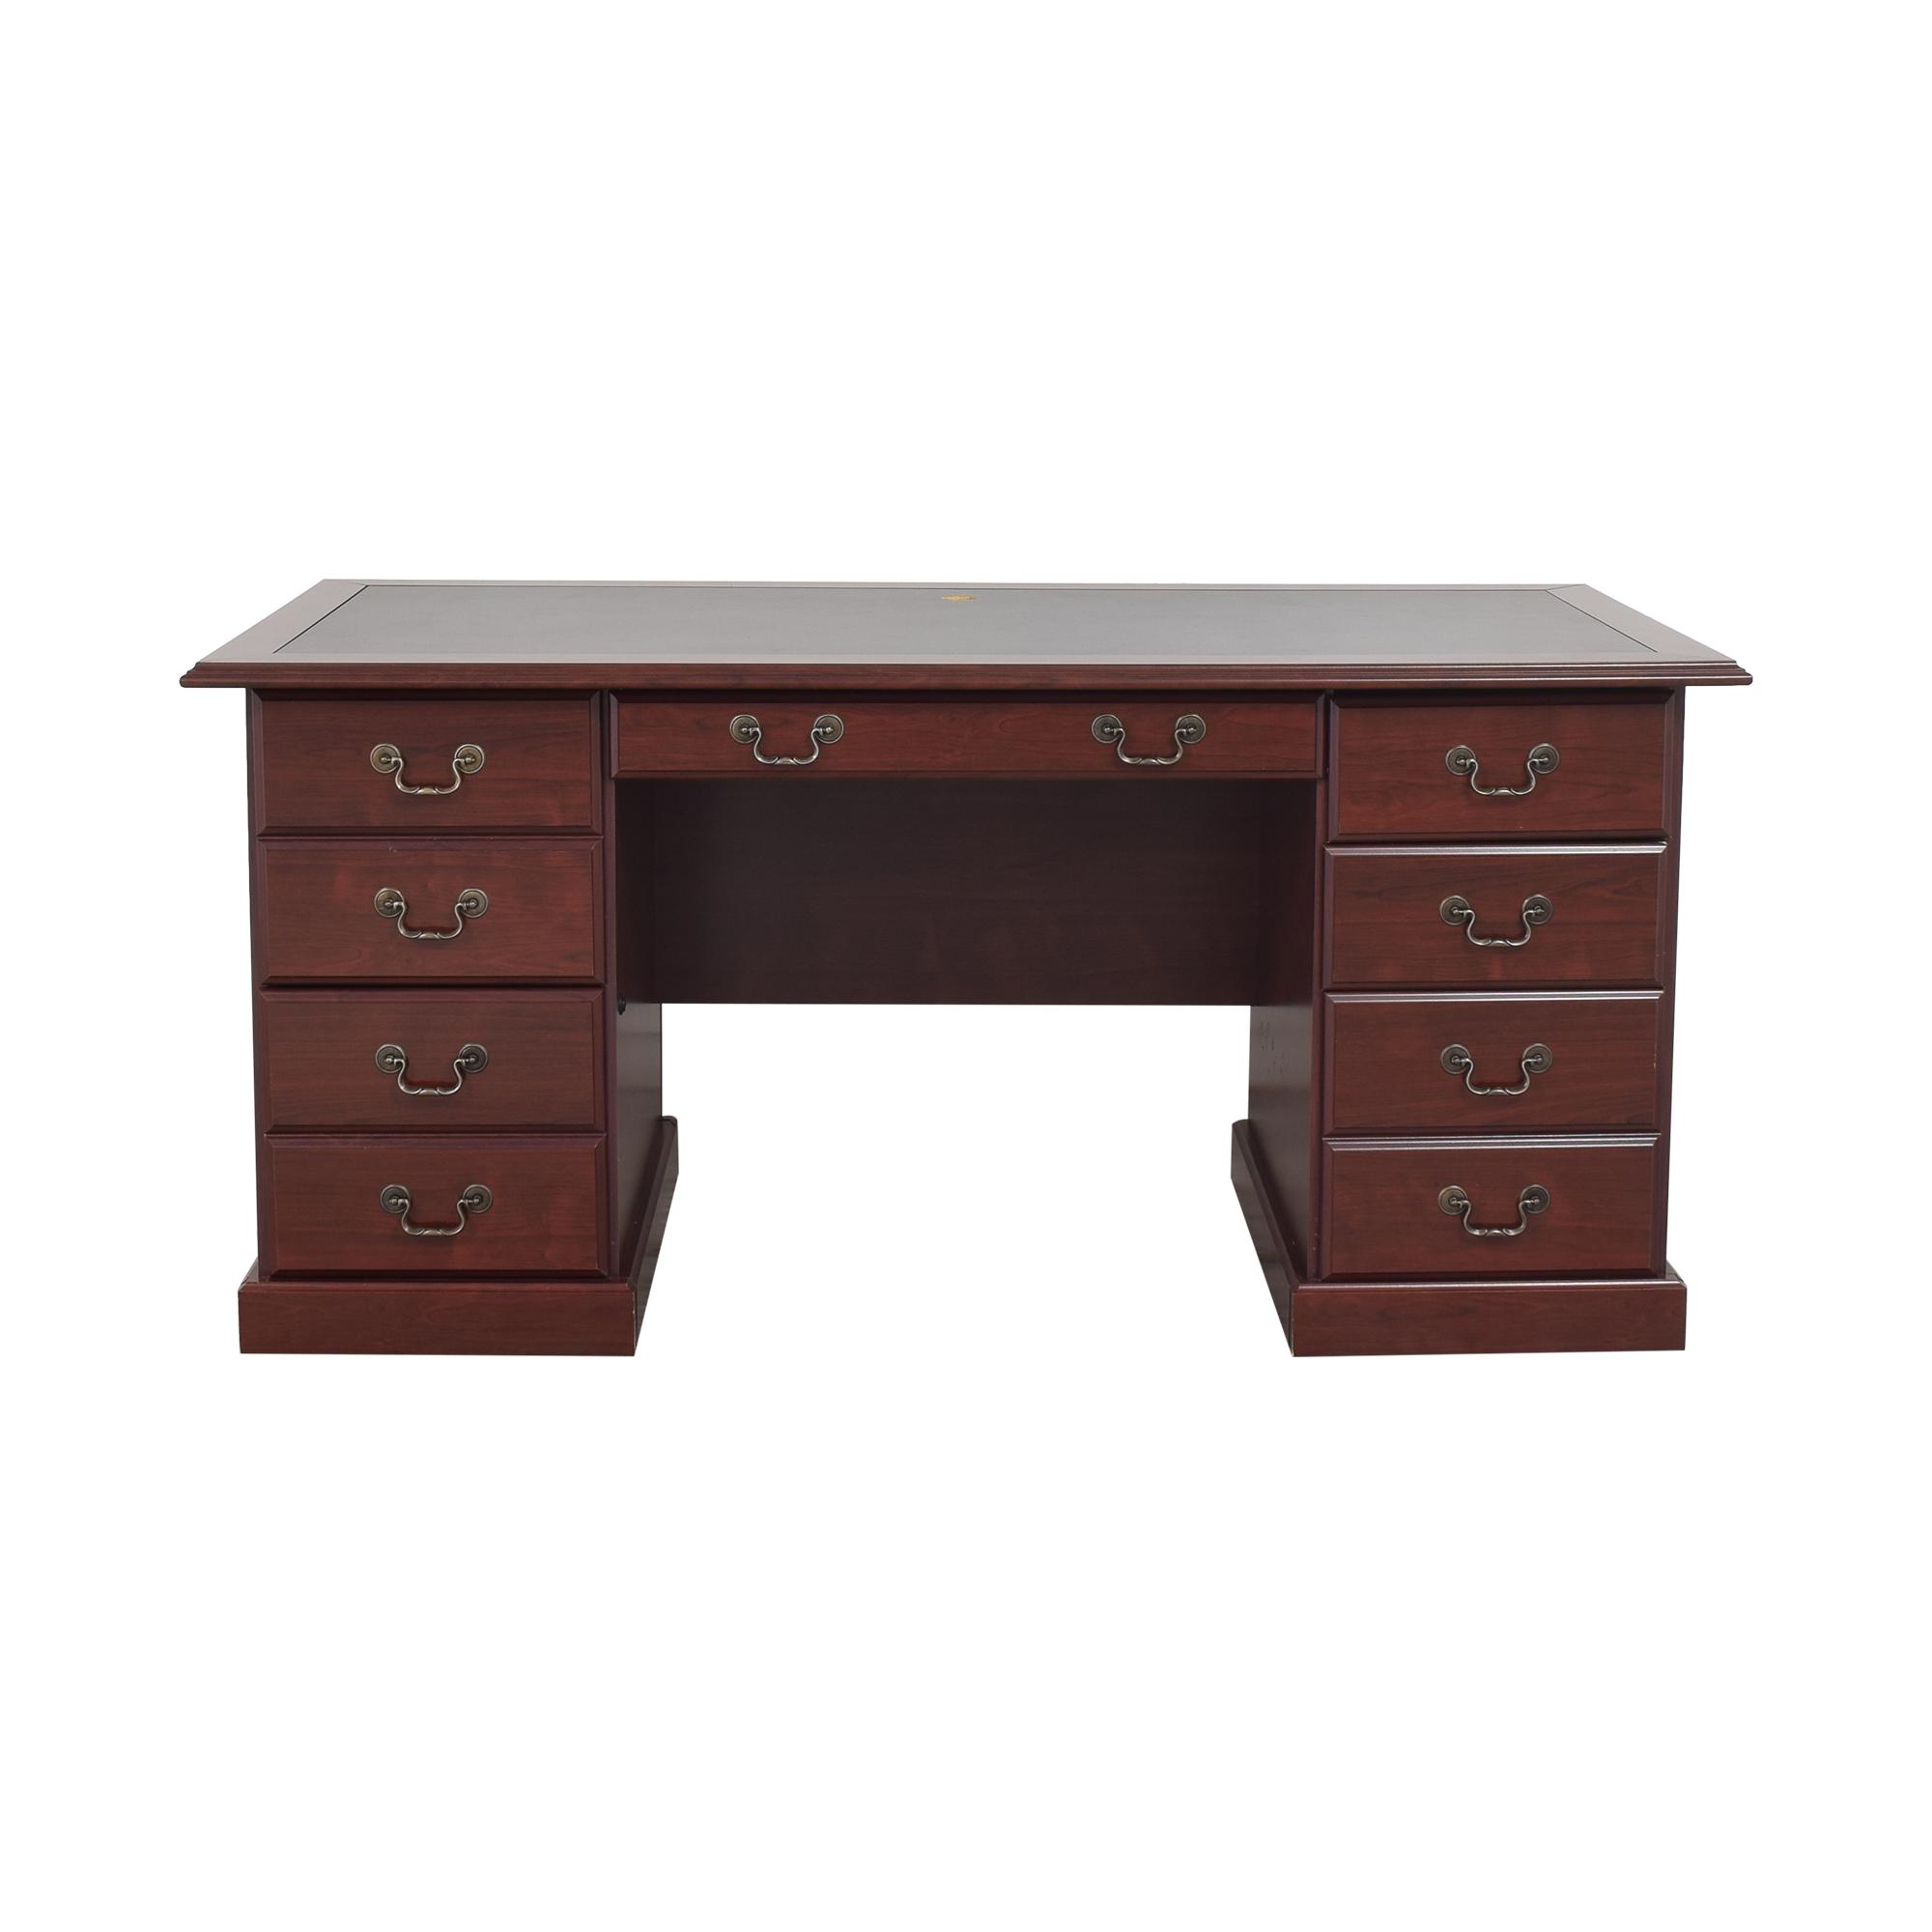 buy Sauder Heritage Hill Executive Desk Sauder Tables